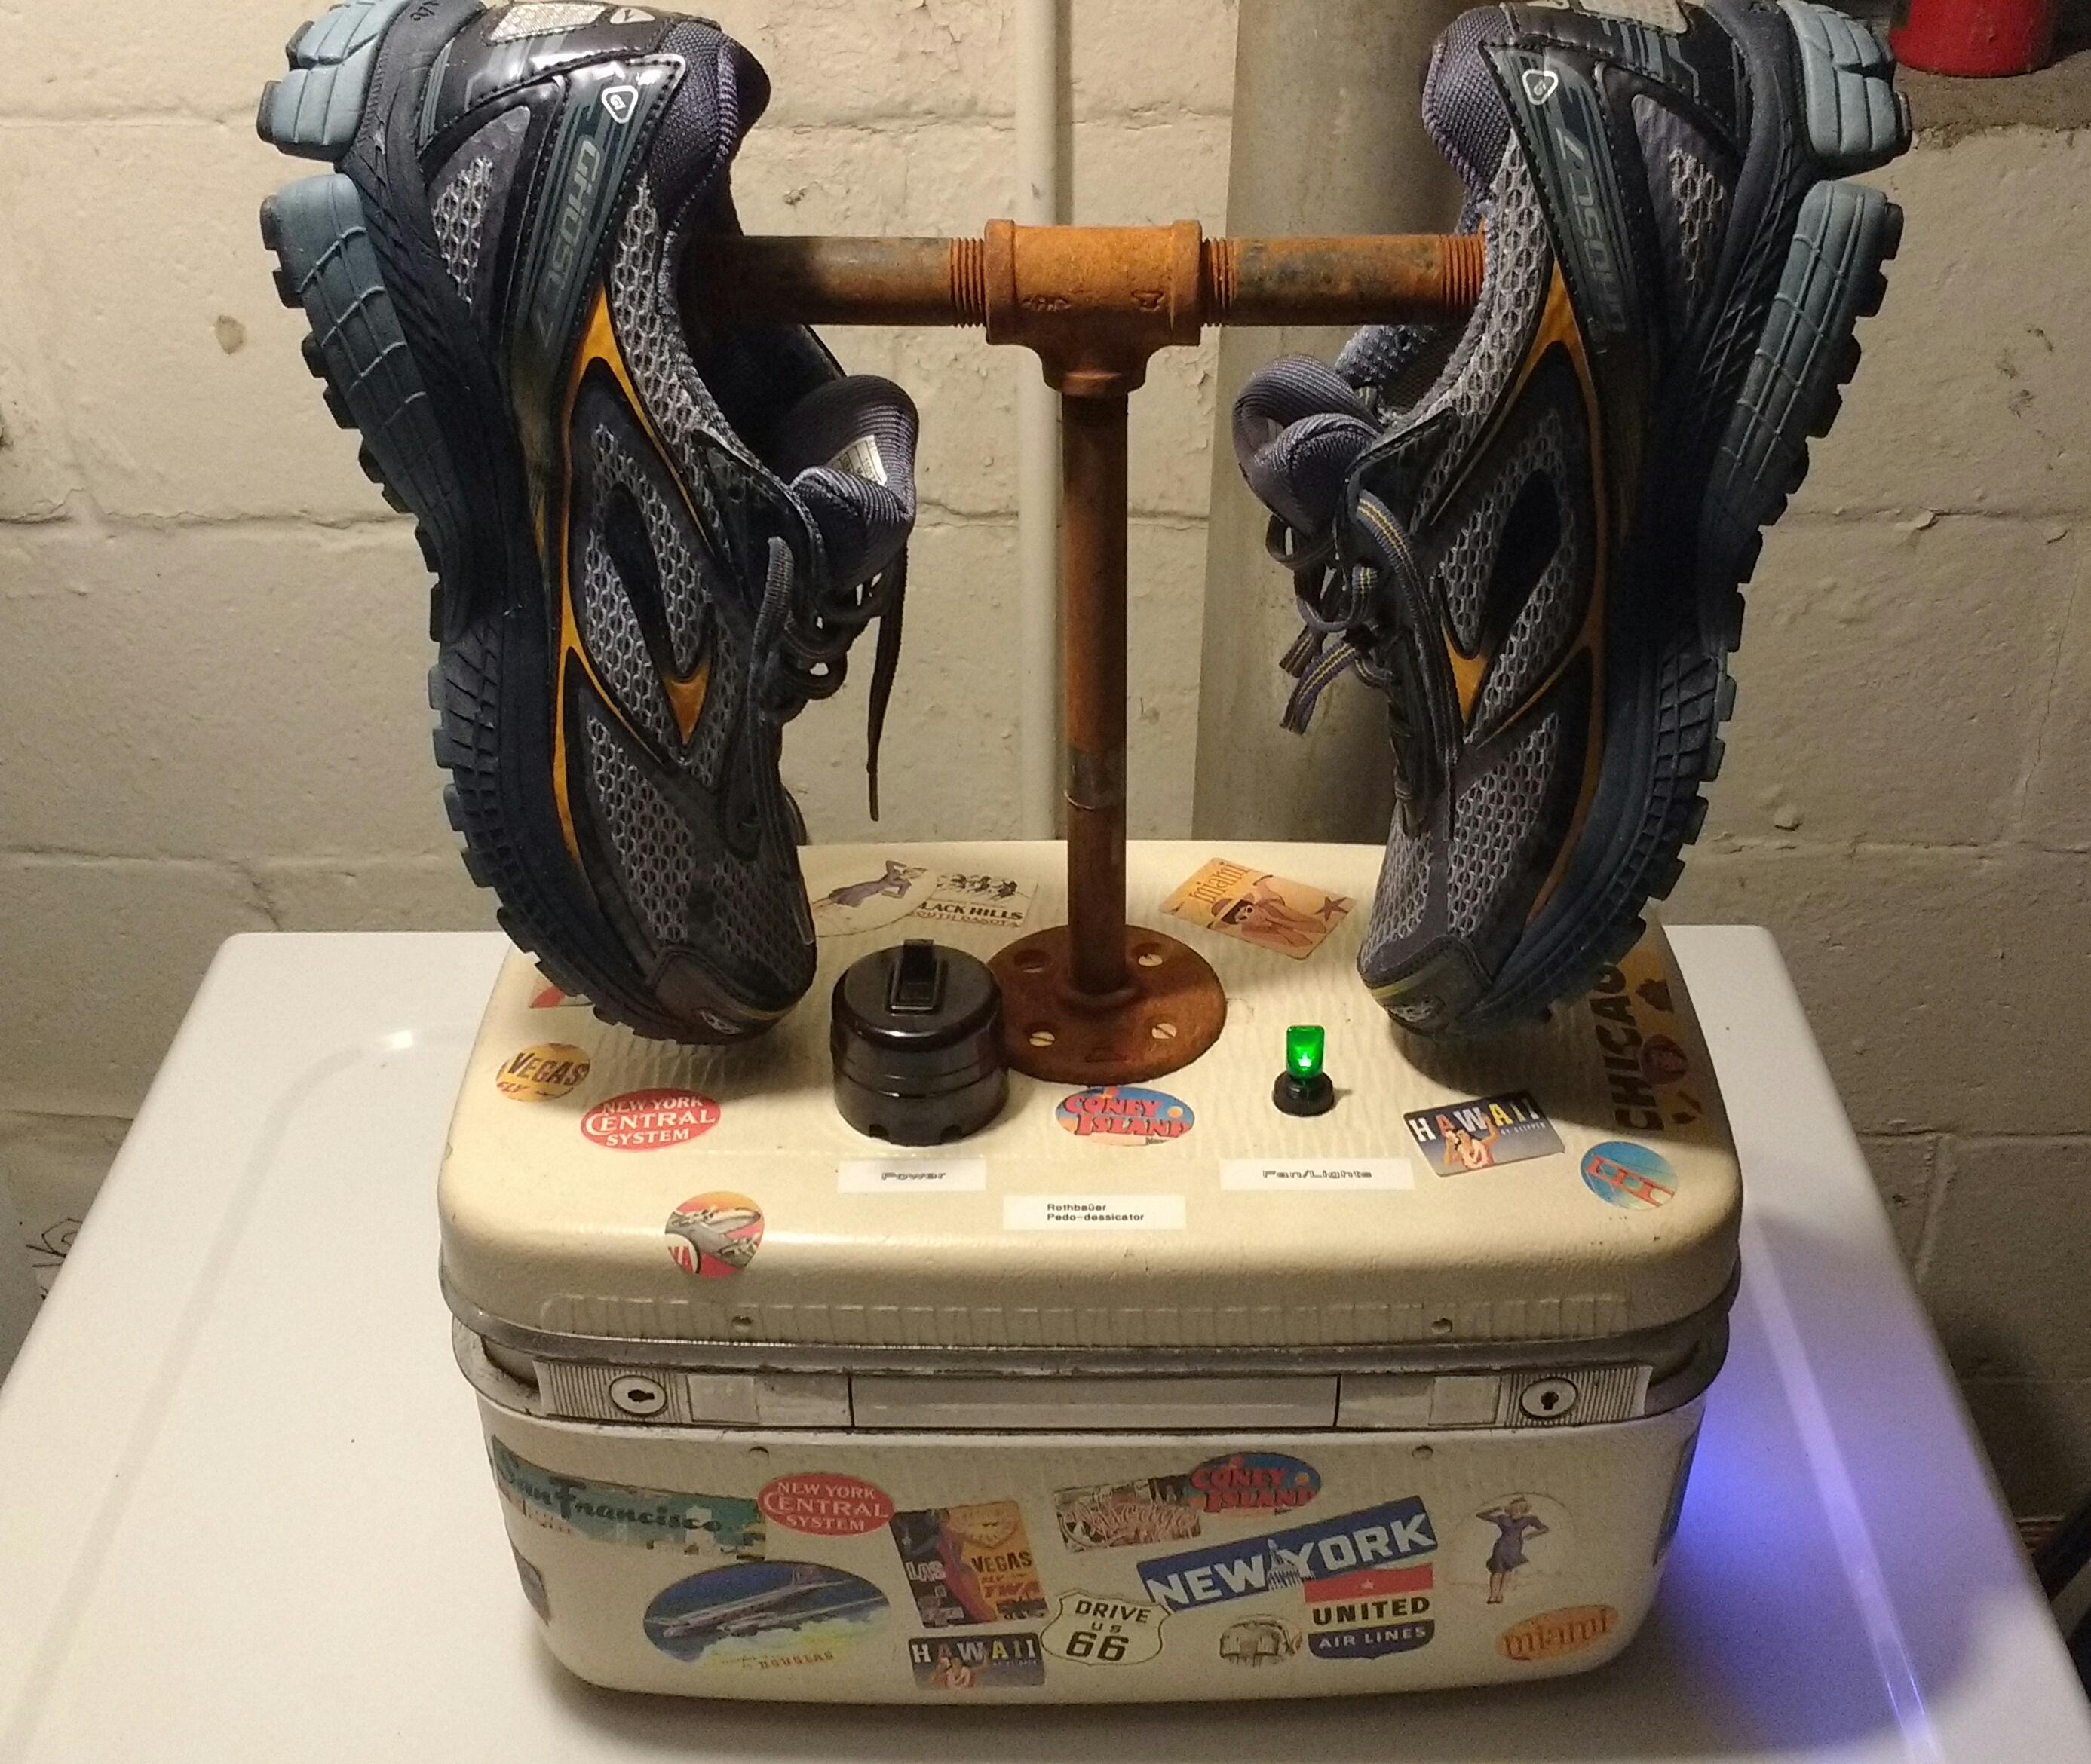 Steampunk Running Shoe Dryer: The Rauthbauer Pedo-Dessicator